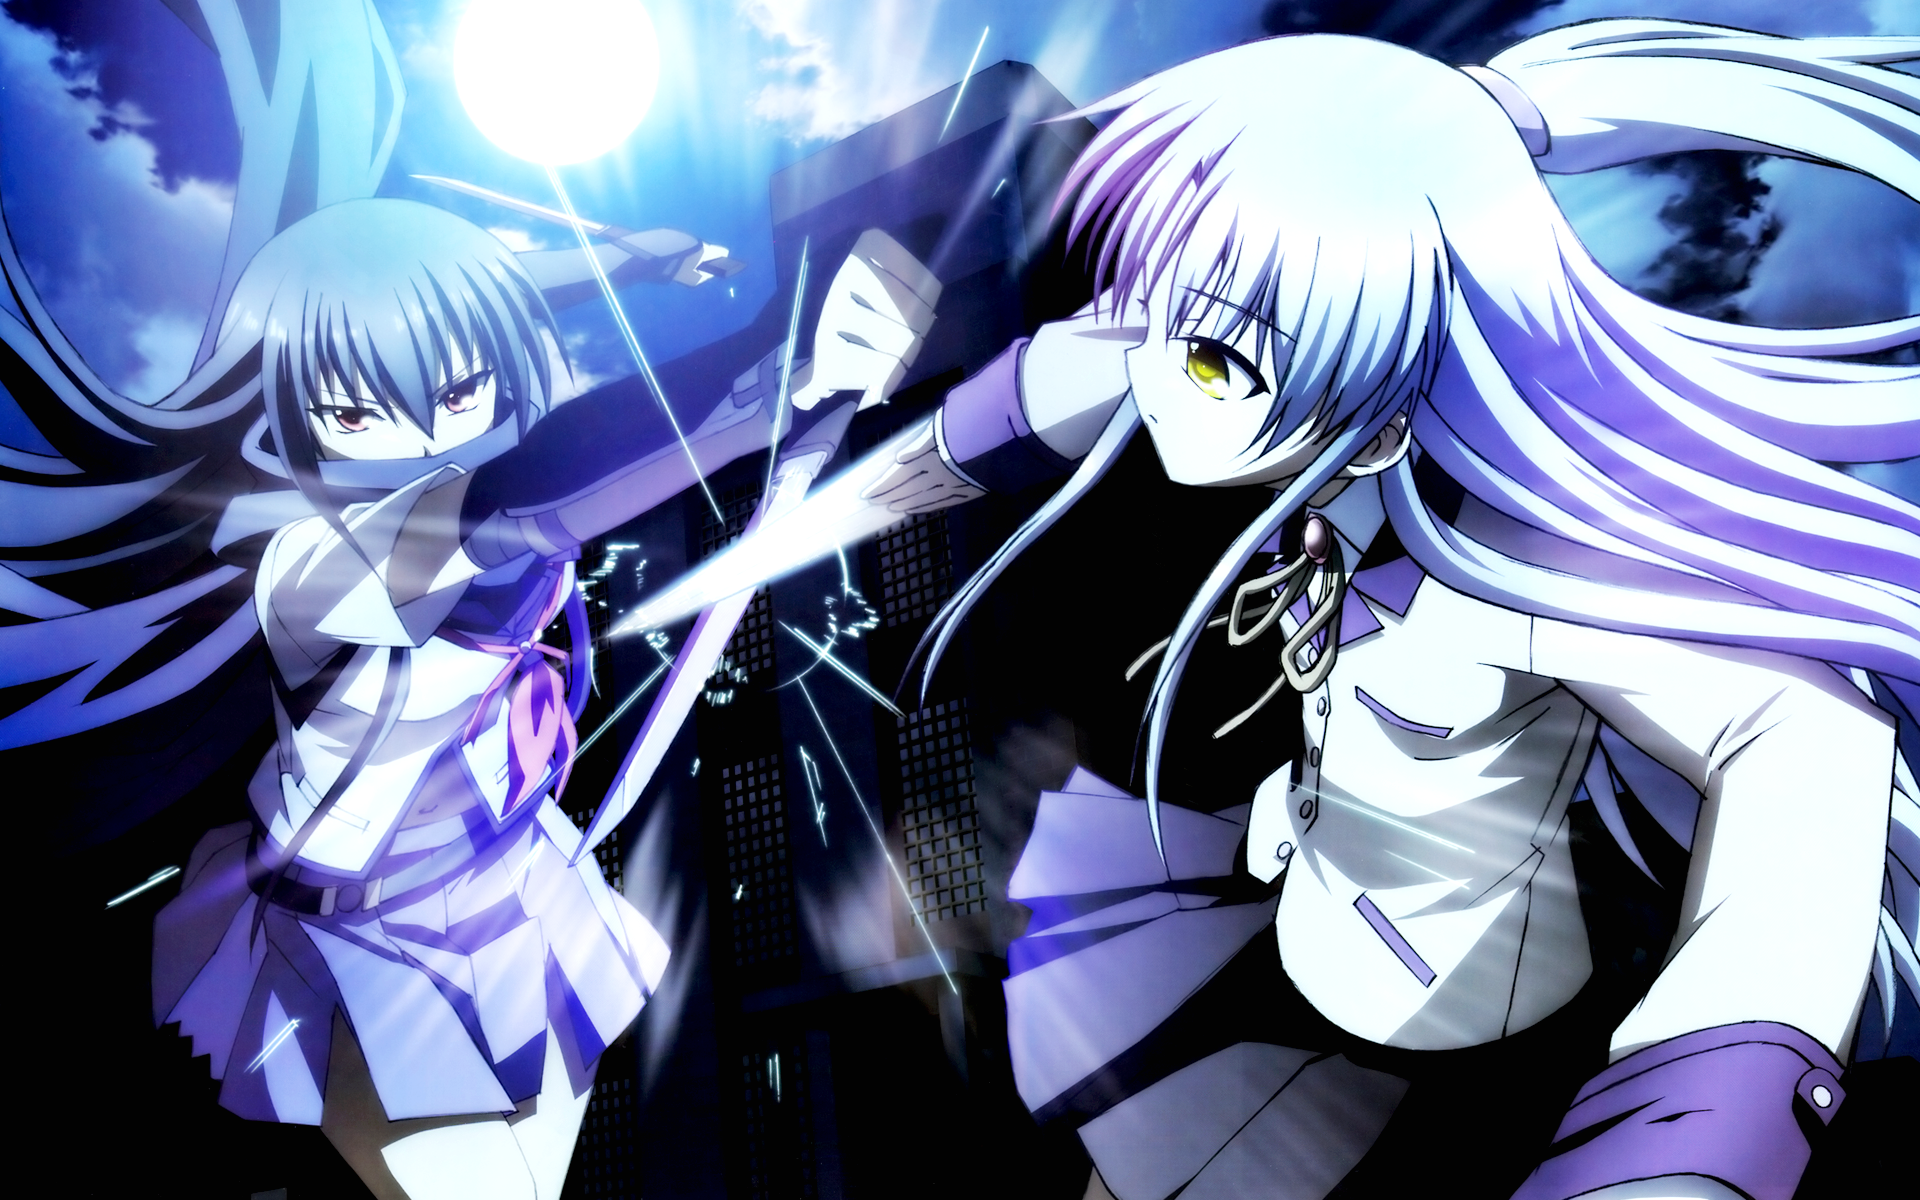 Angel Beats Wallpaper Tenshi Wallpaper Angel Beats Beats Wallpaper Angel Beats Anime